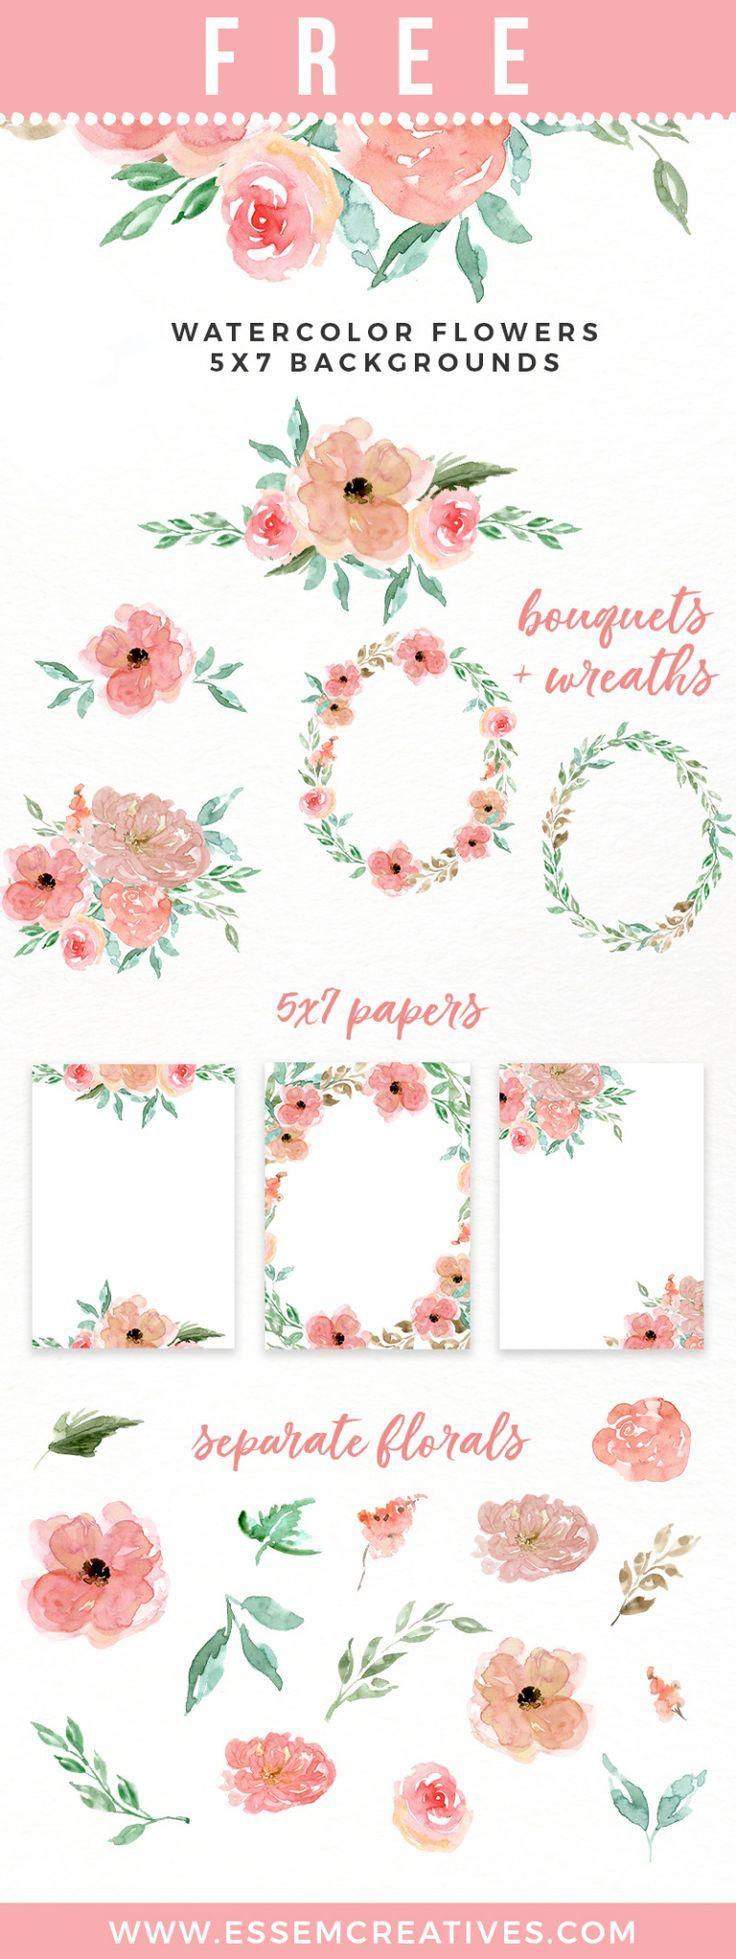 Free Peachy Pink Watercolor Flower Collection Wasserfarbenblumen